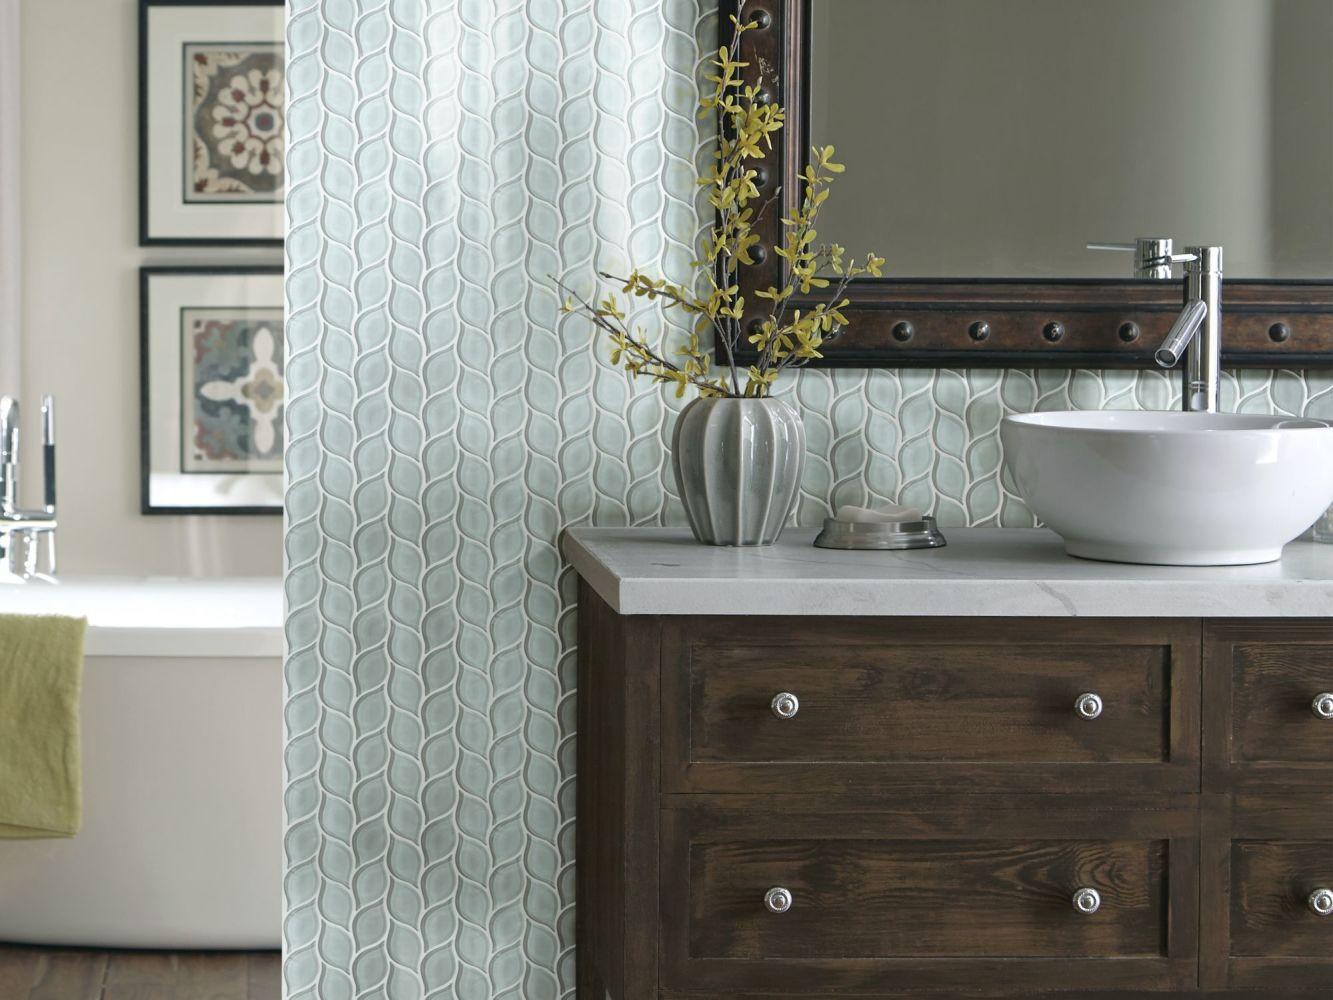 Shaw Floors Home Fn Gold Ceramic Principal Petal Glass Mo Cloud 00500_TG82B